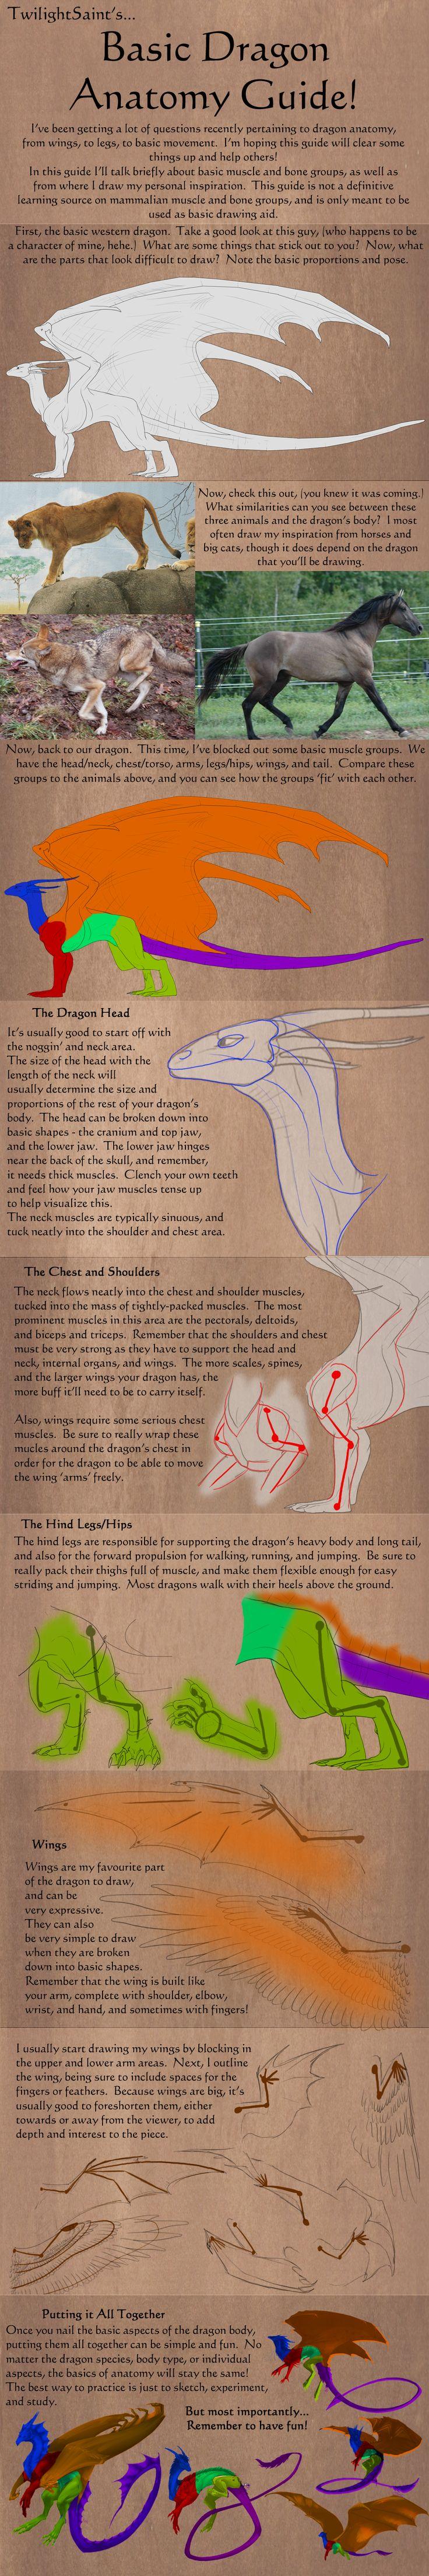 Tutorial - Basic Dragon Anatomy by =TwilightSaint on deviantART